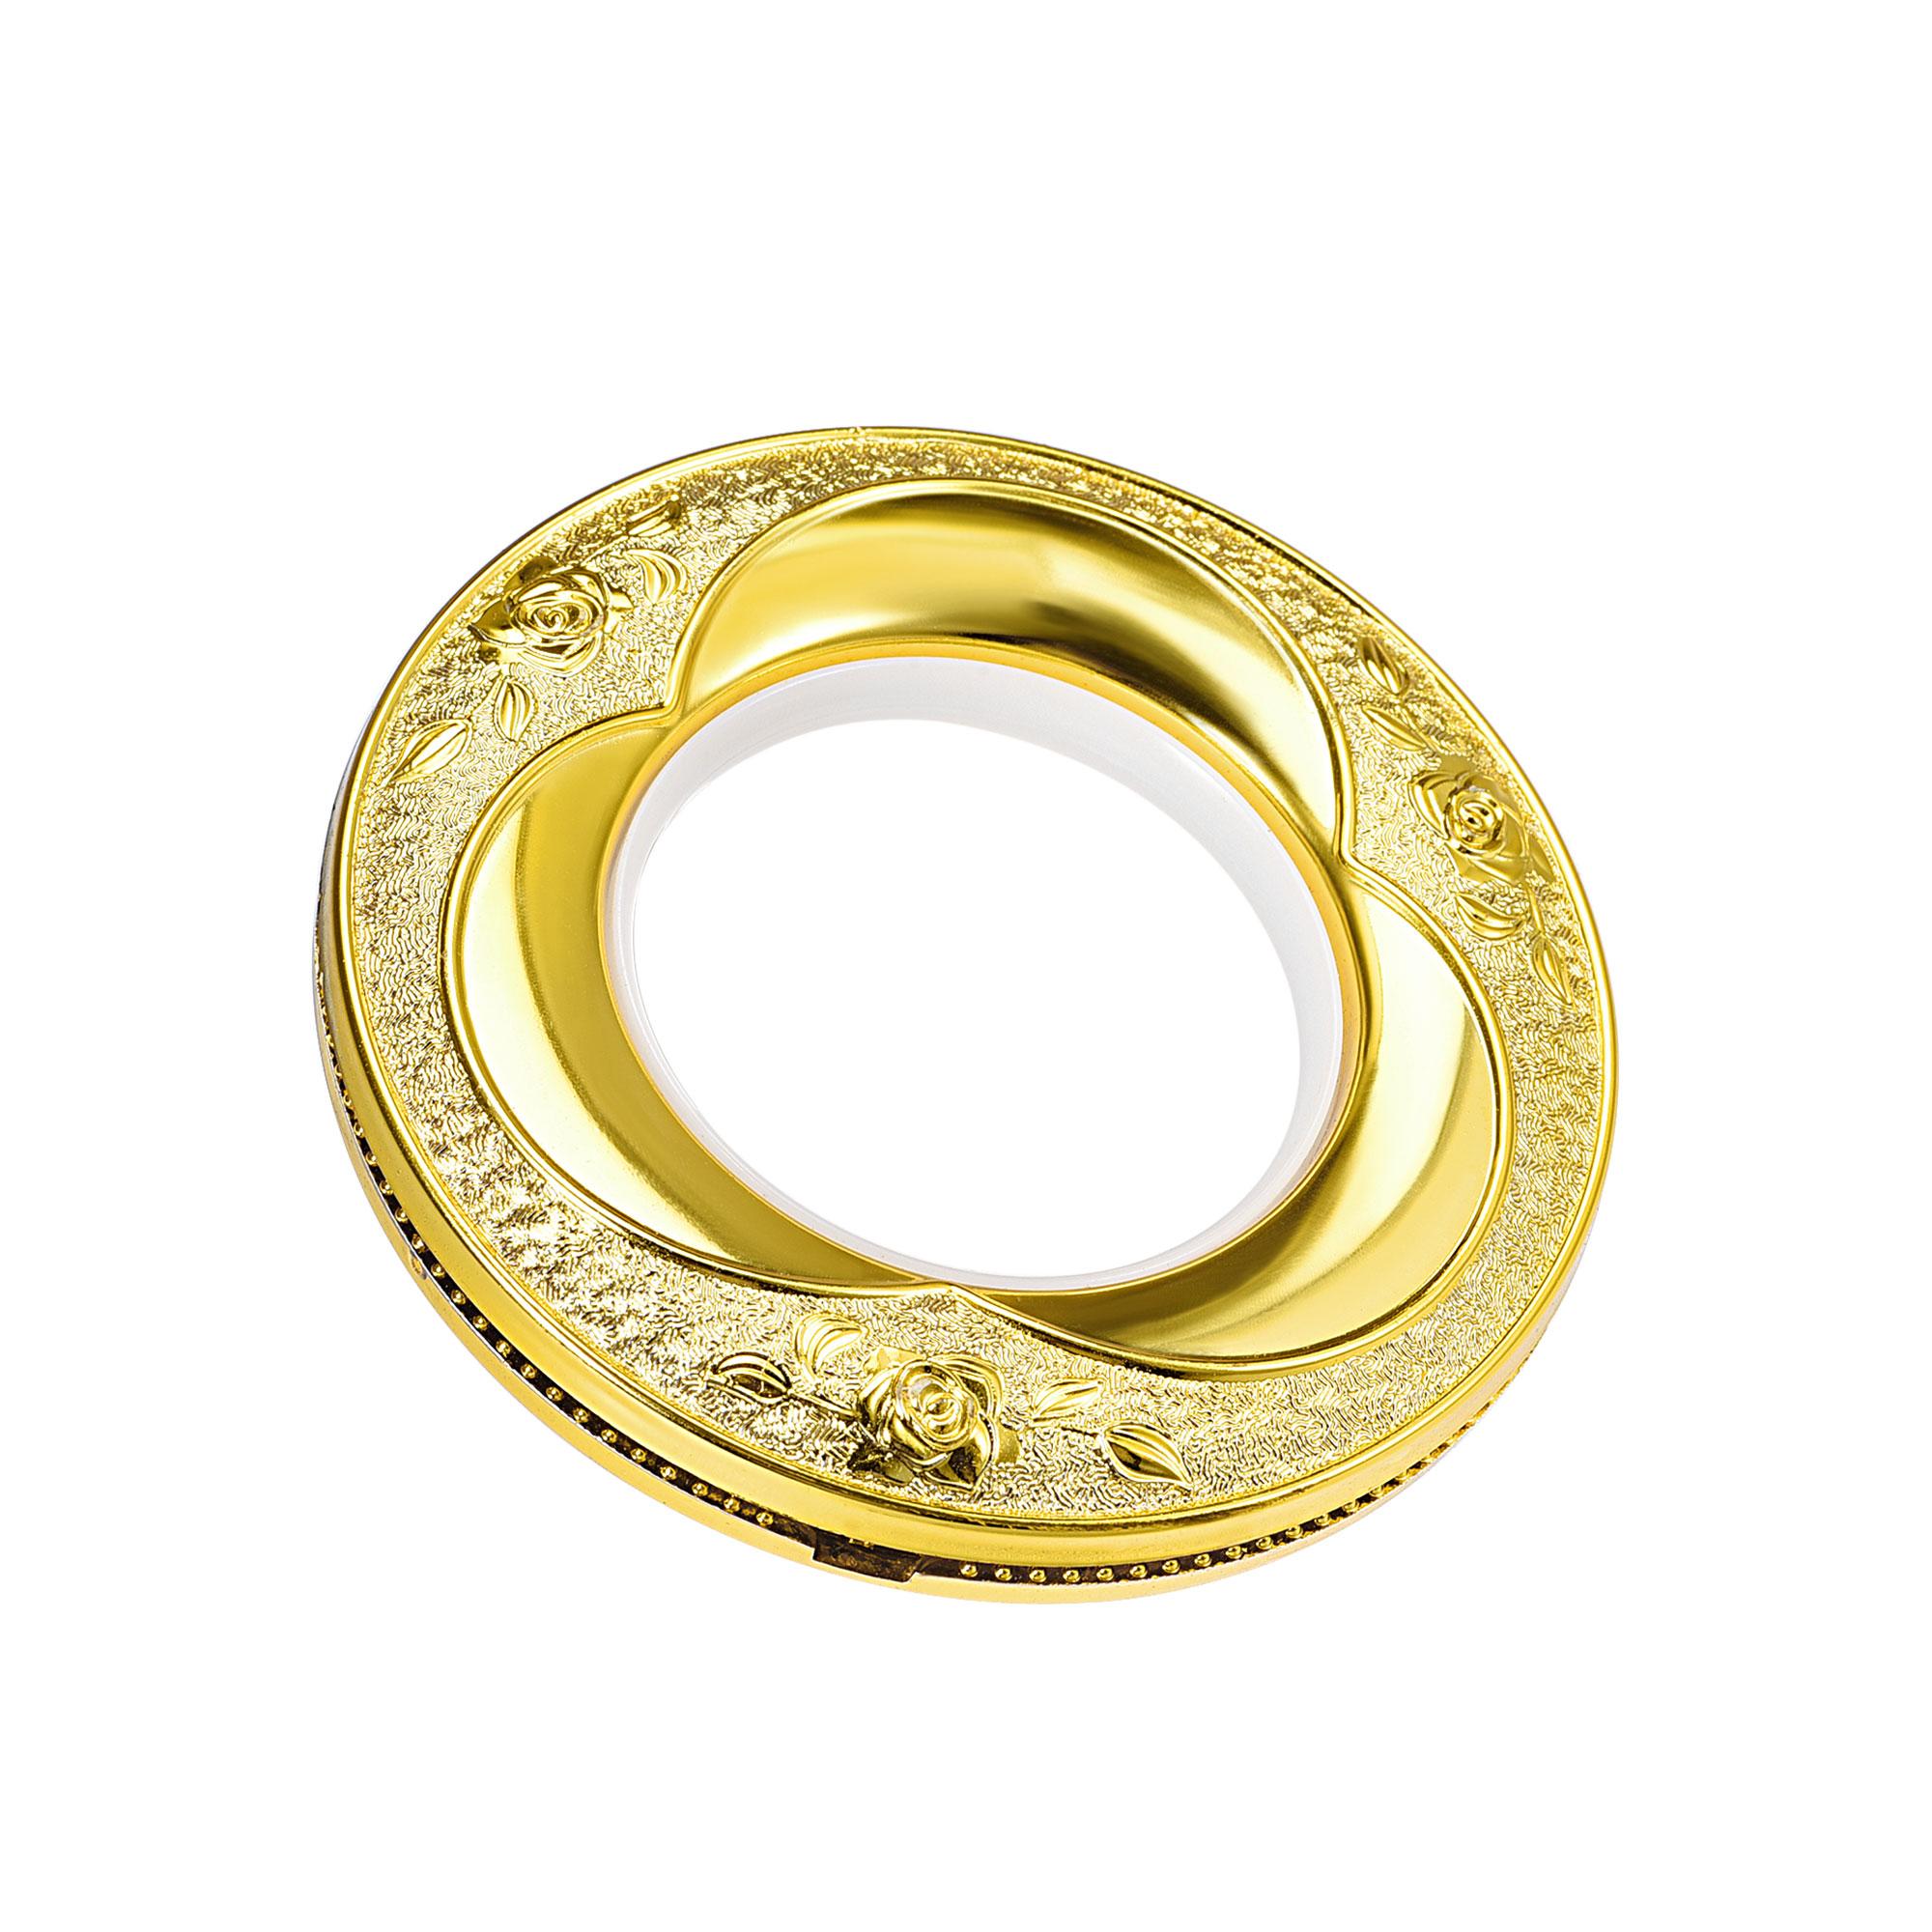 42mm Curtain Grommets Eyelets Roman Rings Home Decor Bright Gold 16pcs